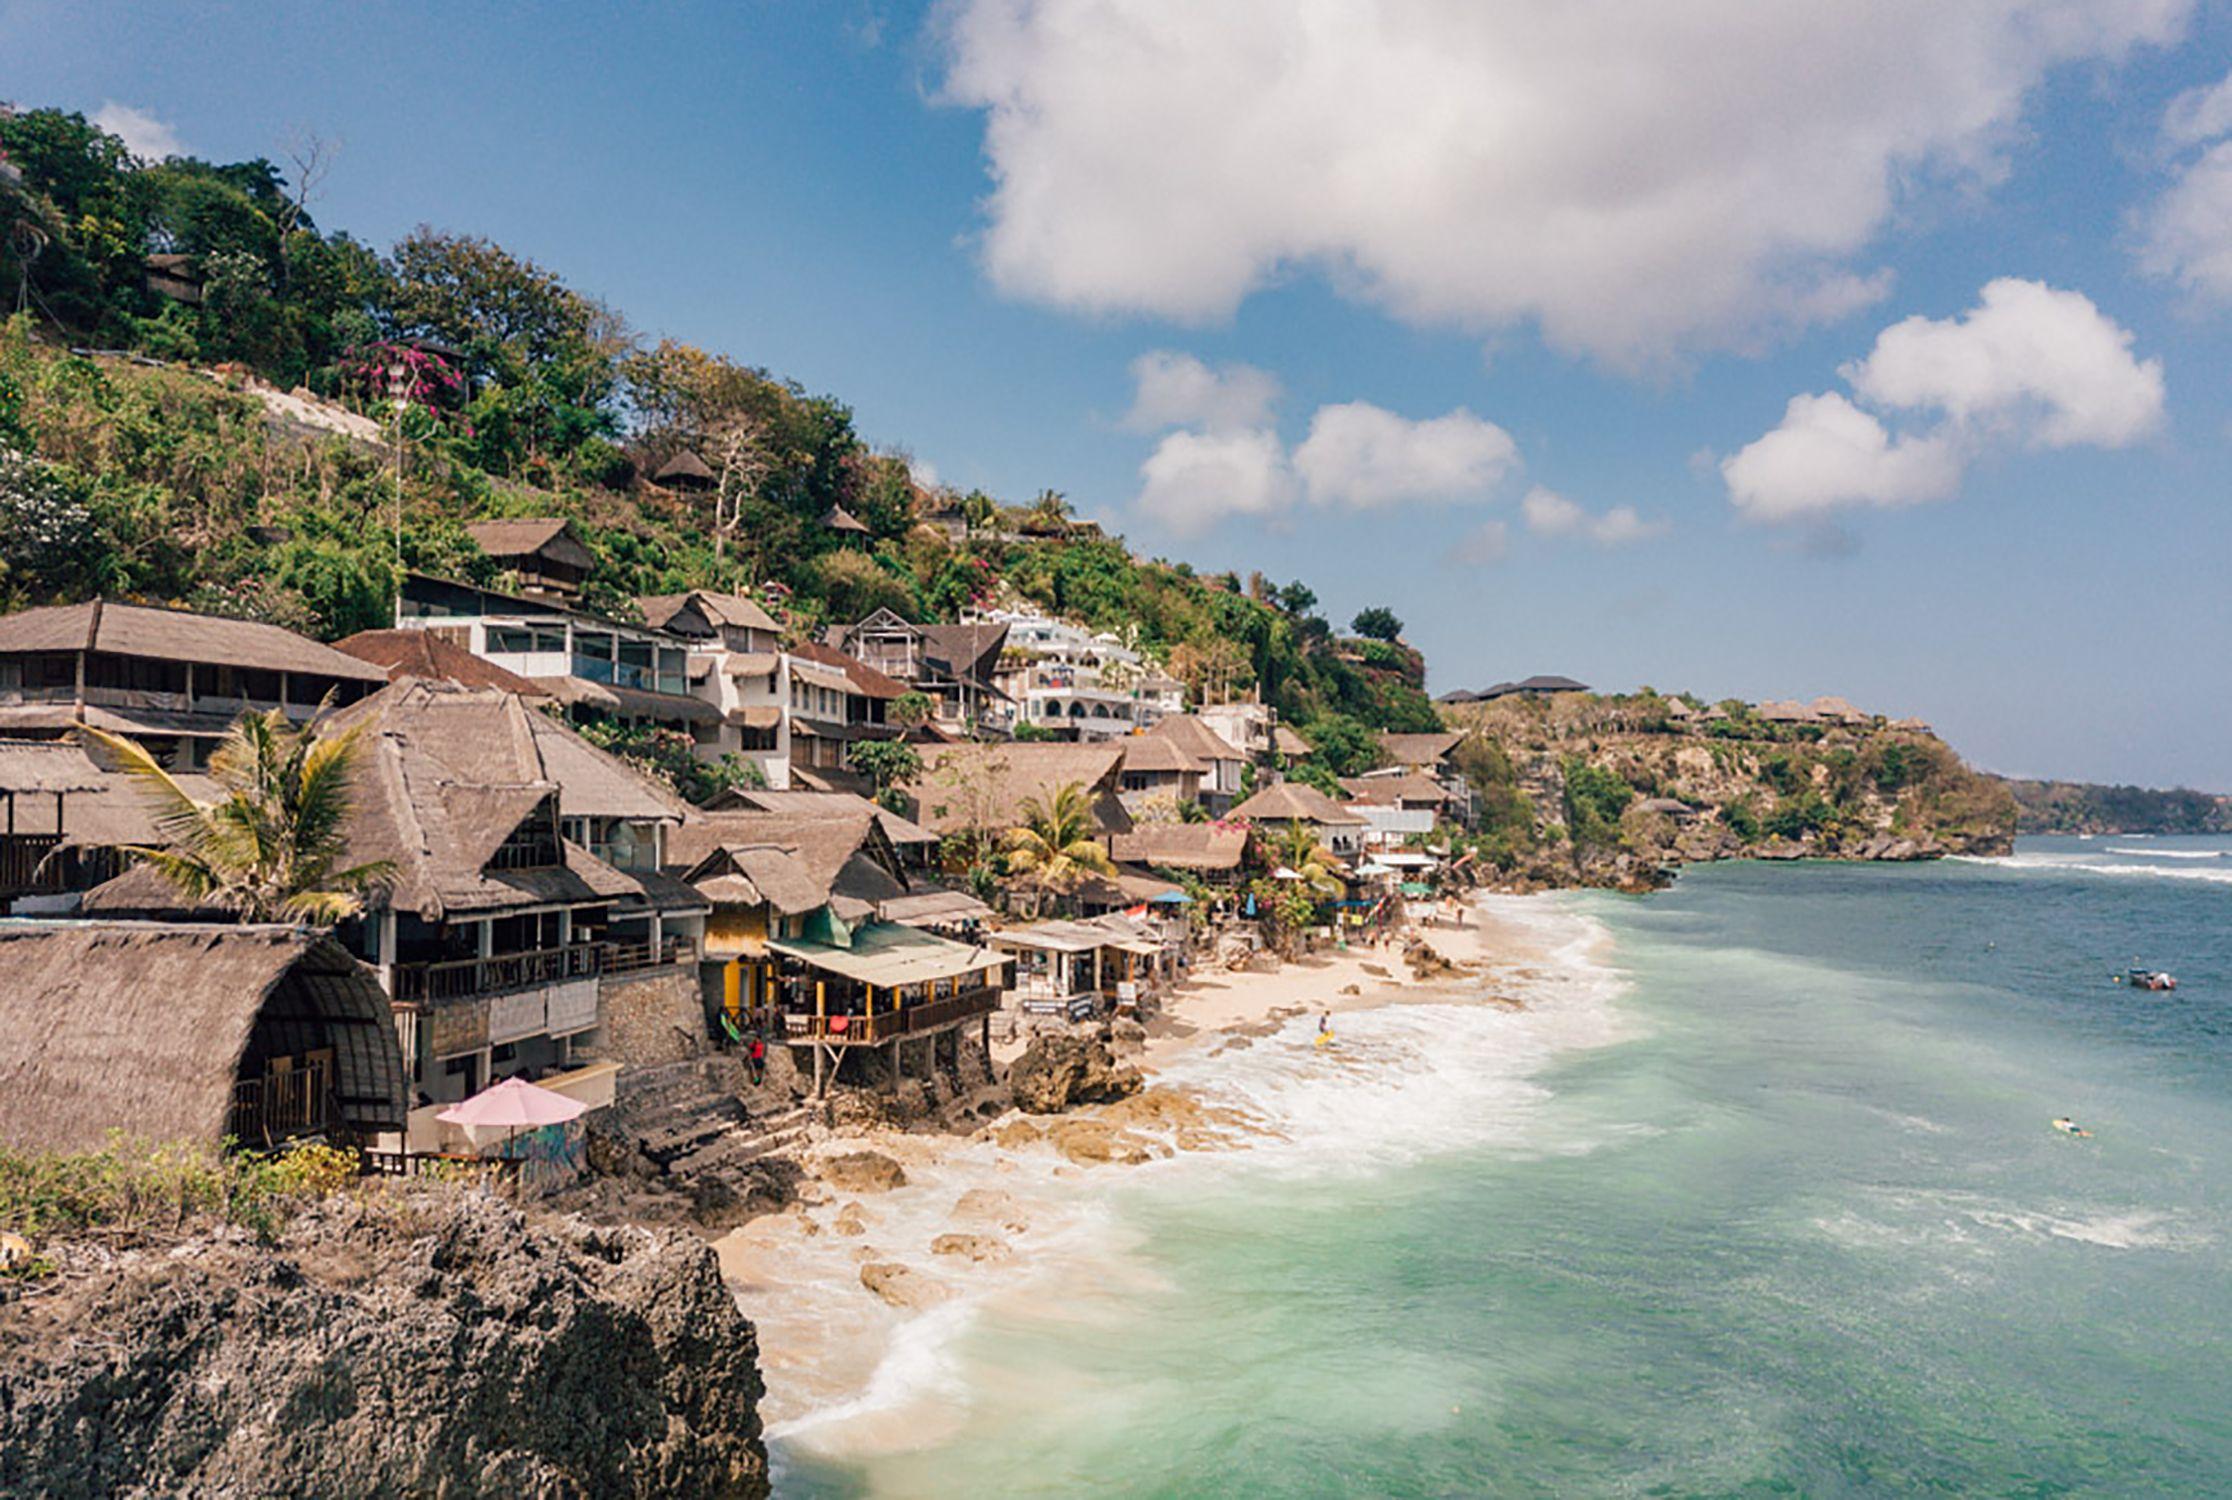 Playa Thomas, Bali